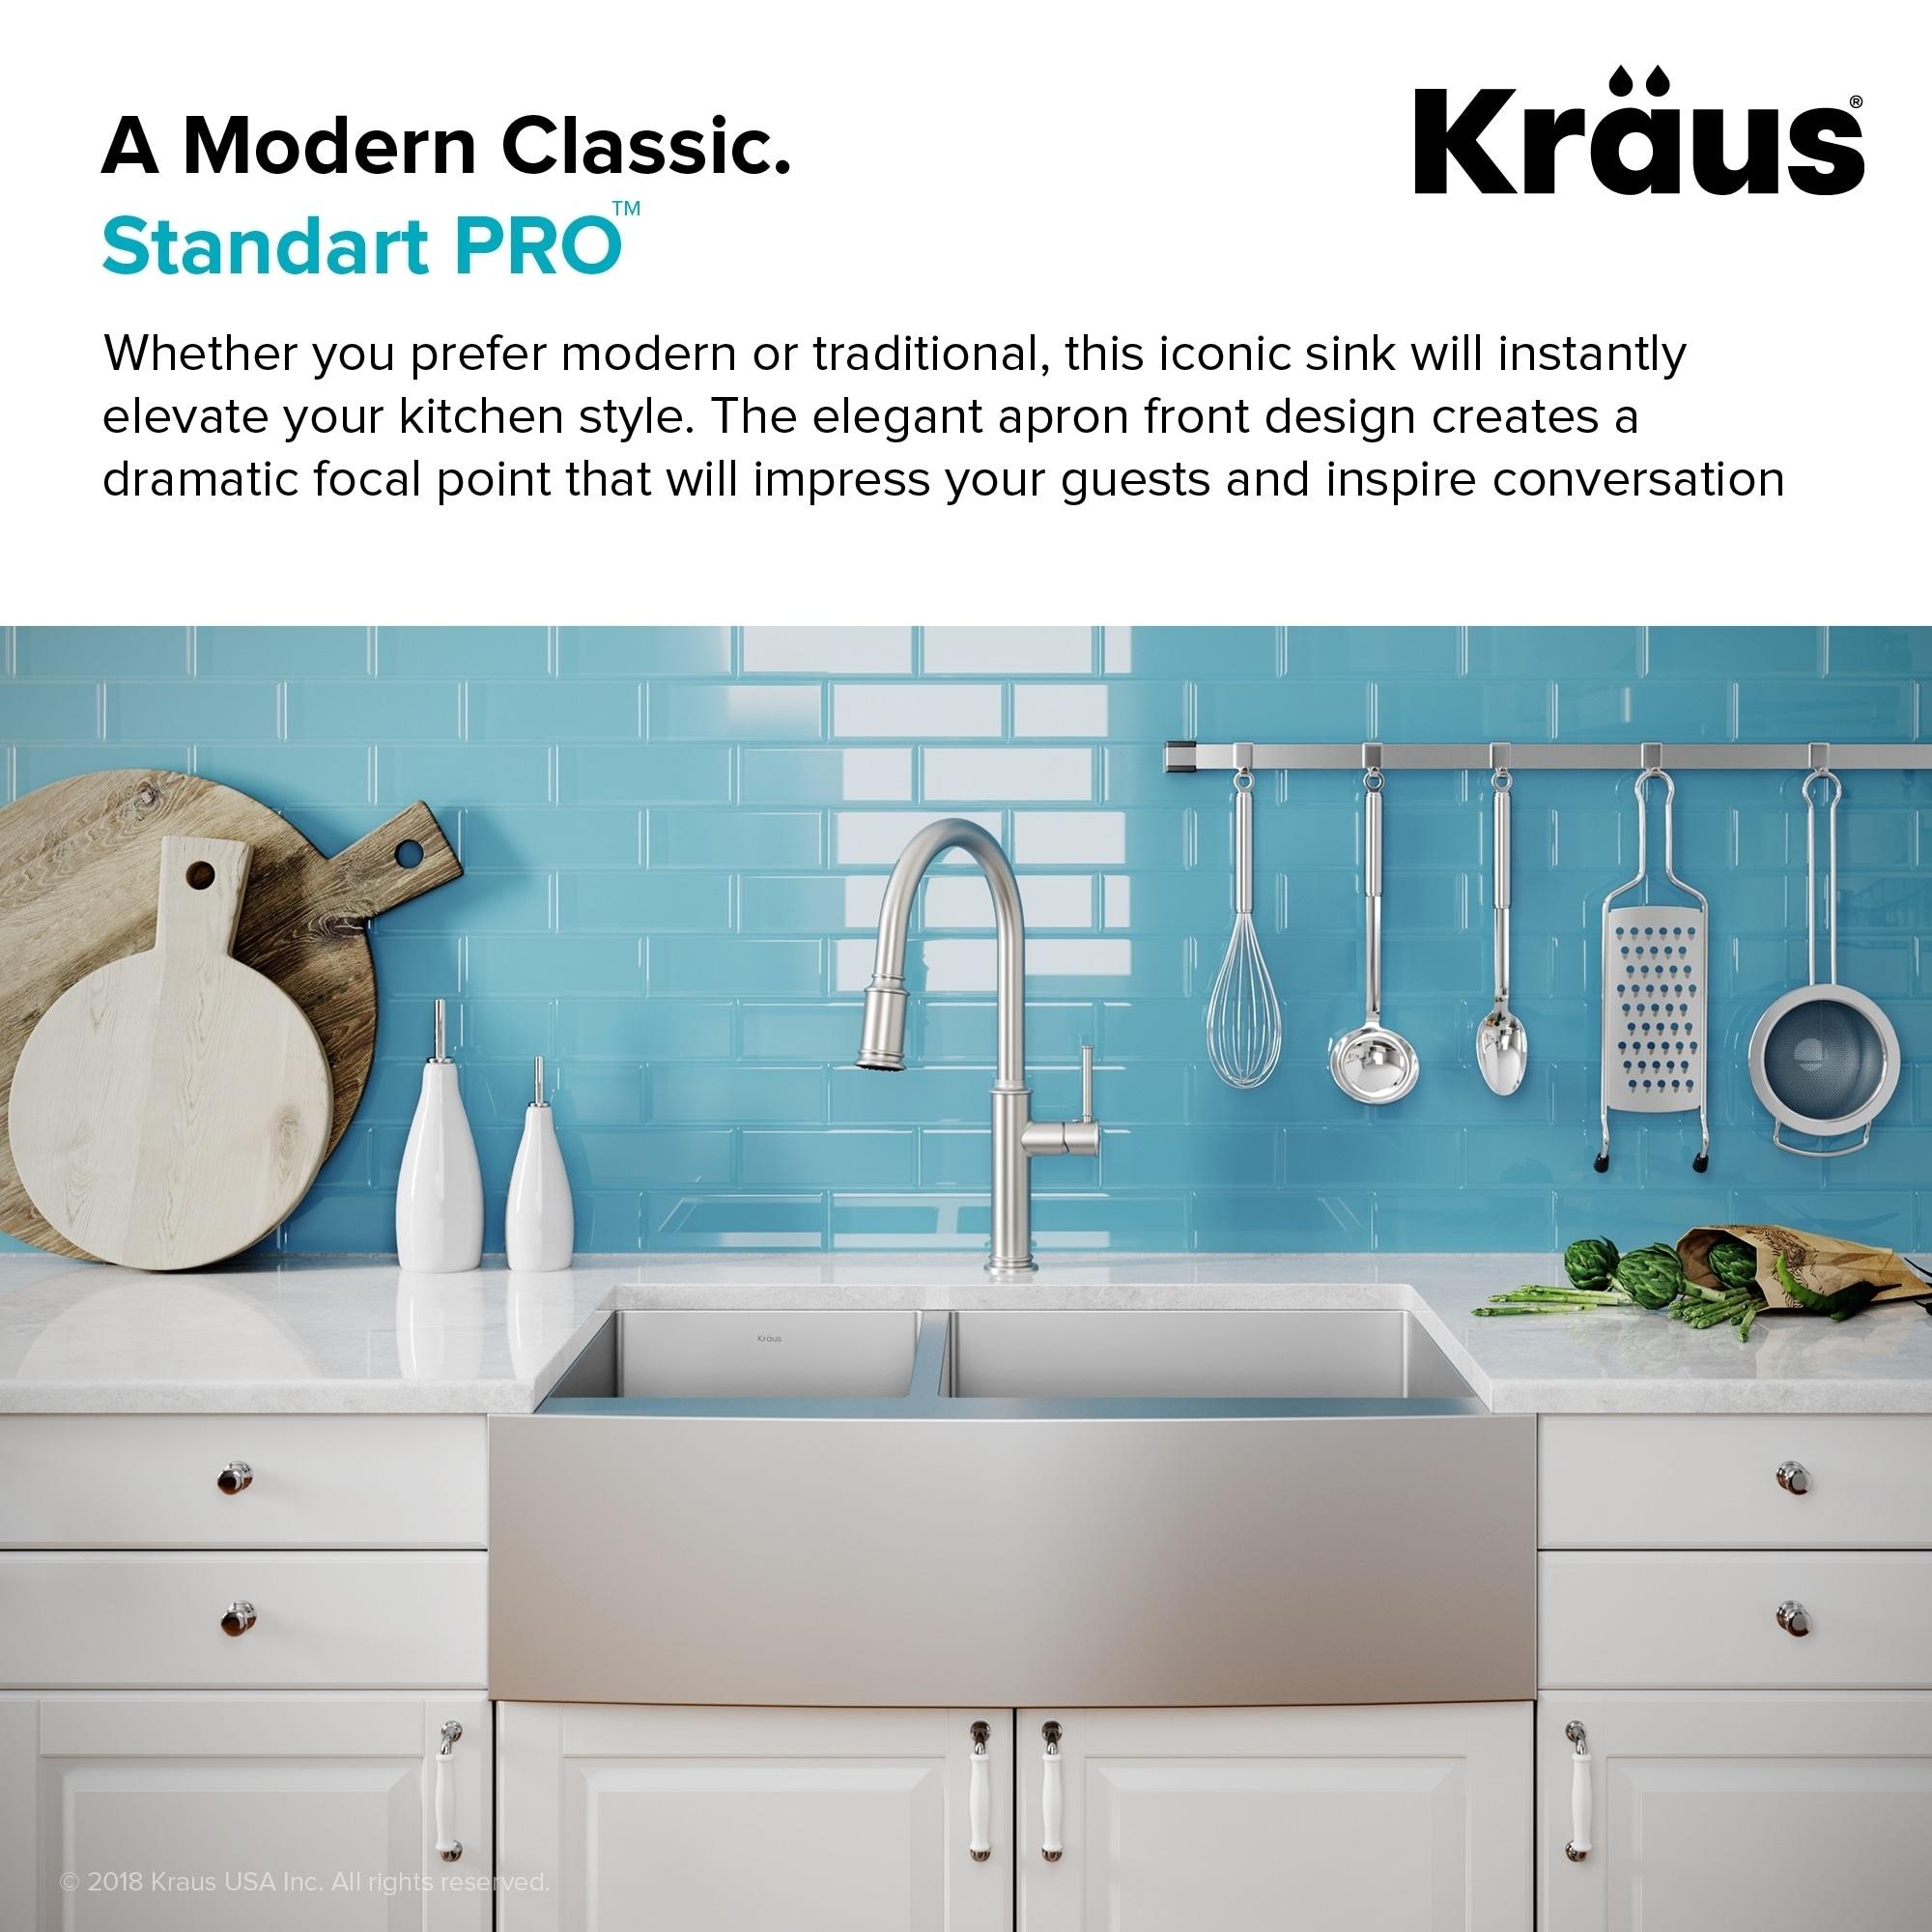 Shop Kraus KHF204-33 Standart PRO Farmhouse Apron 33-inch 16 gauge ...